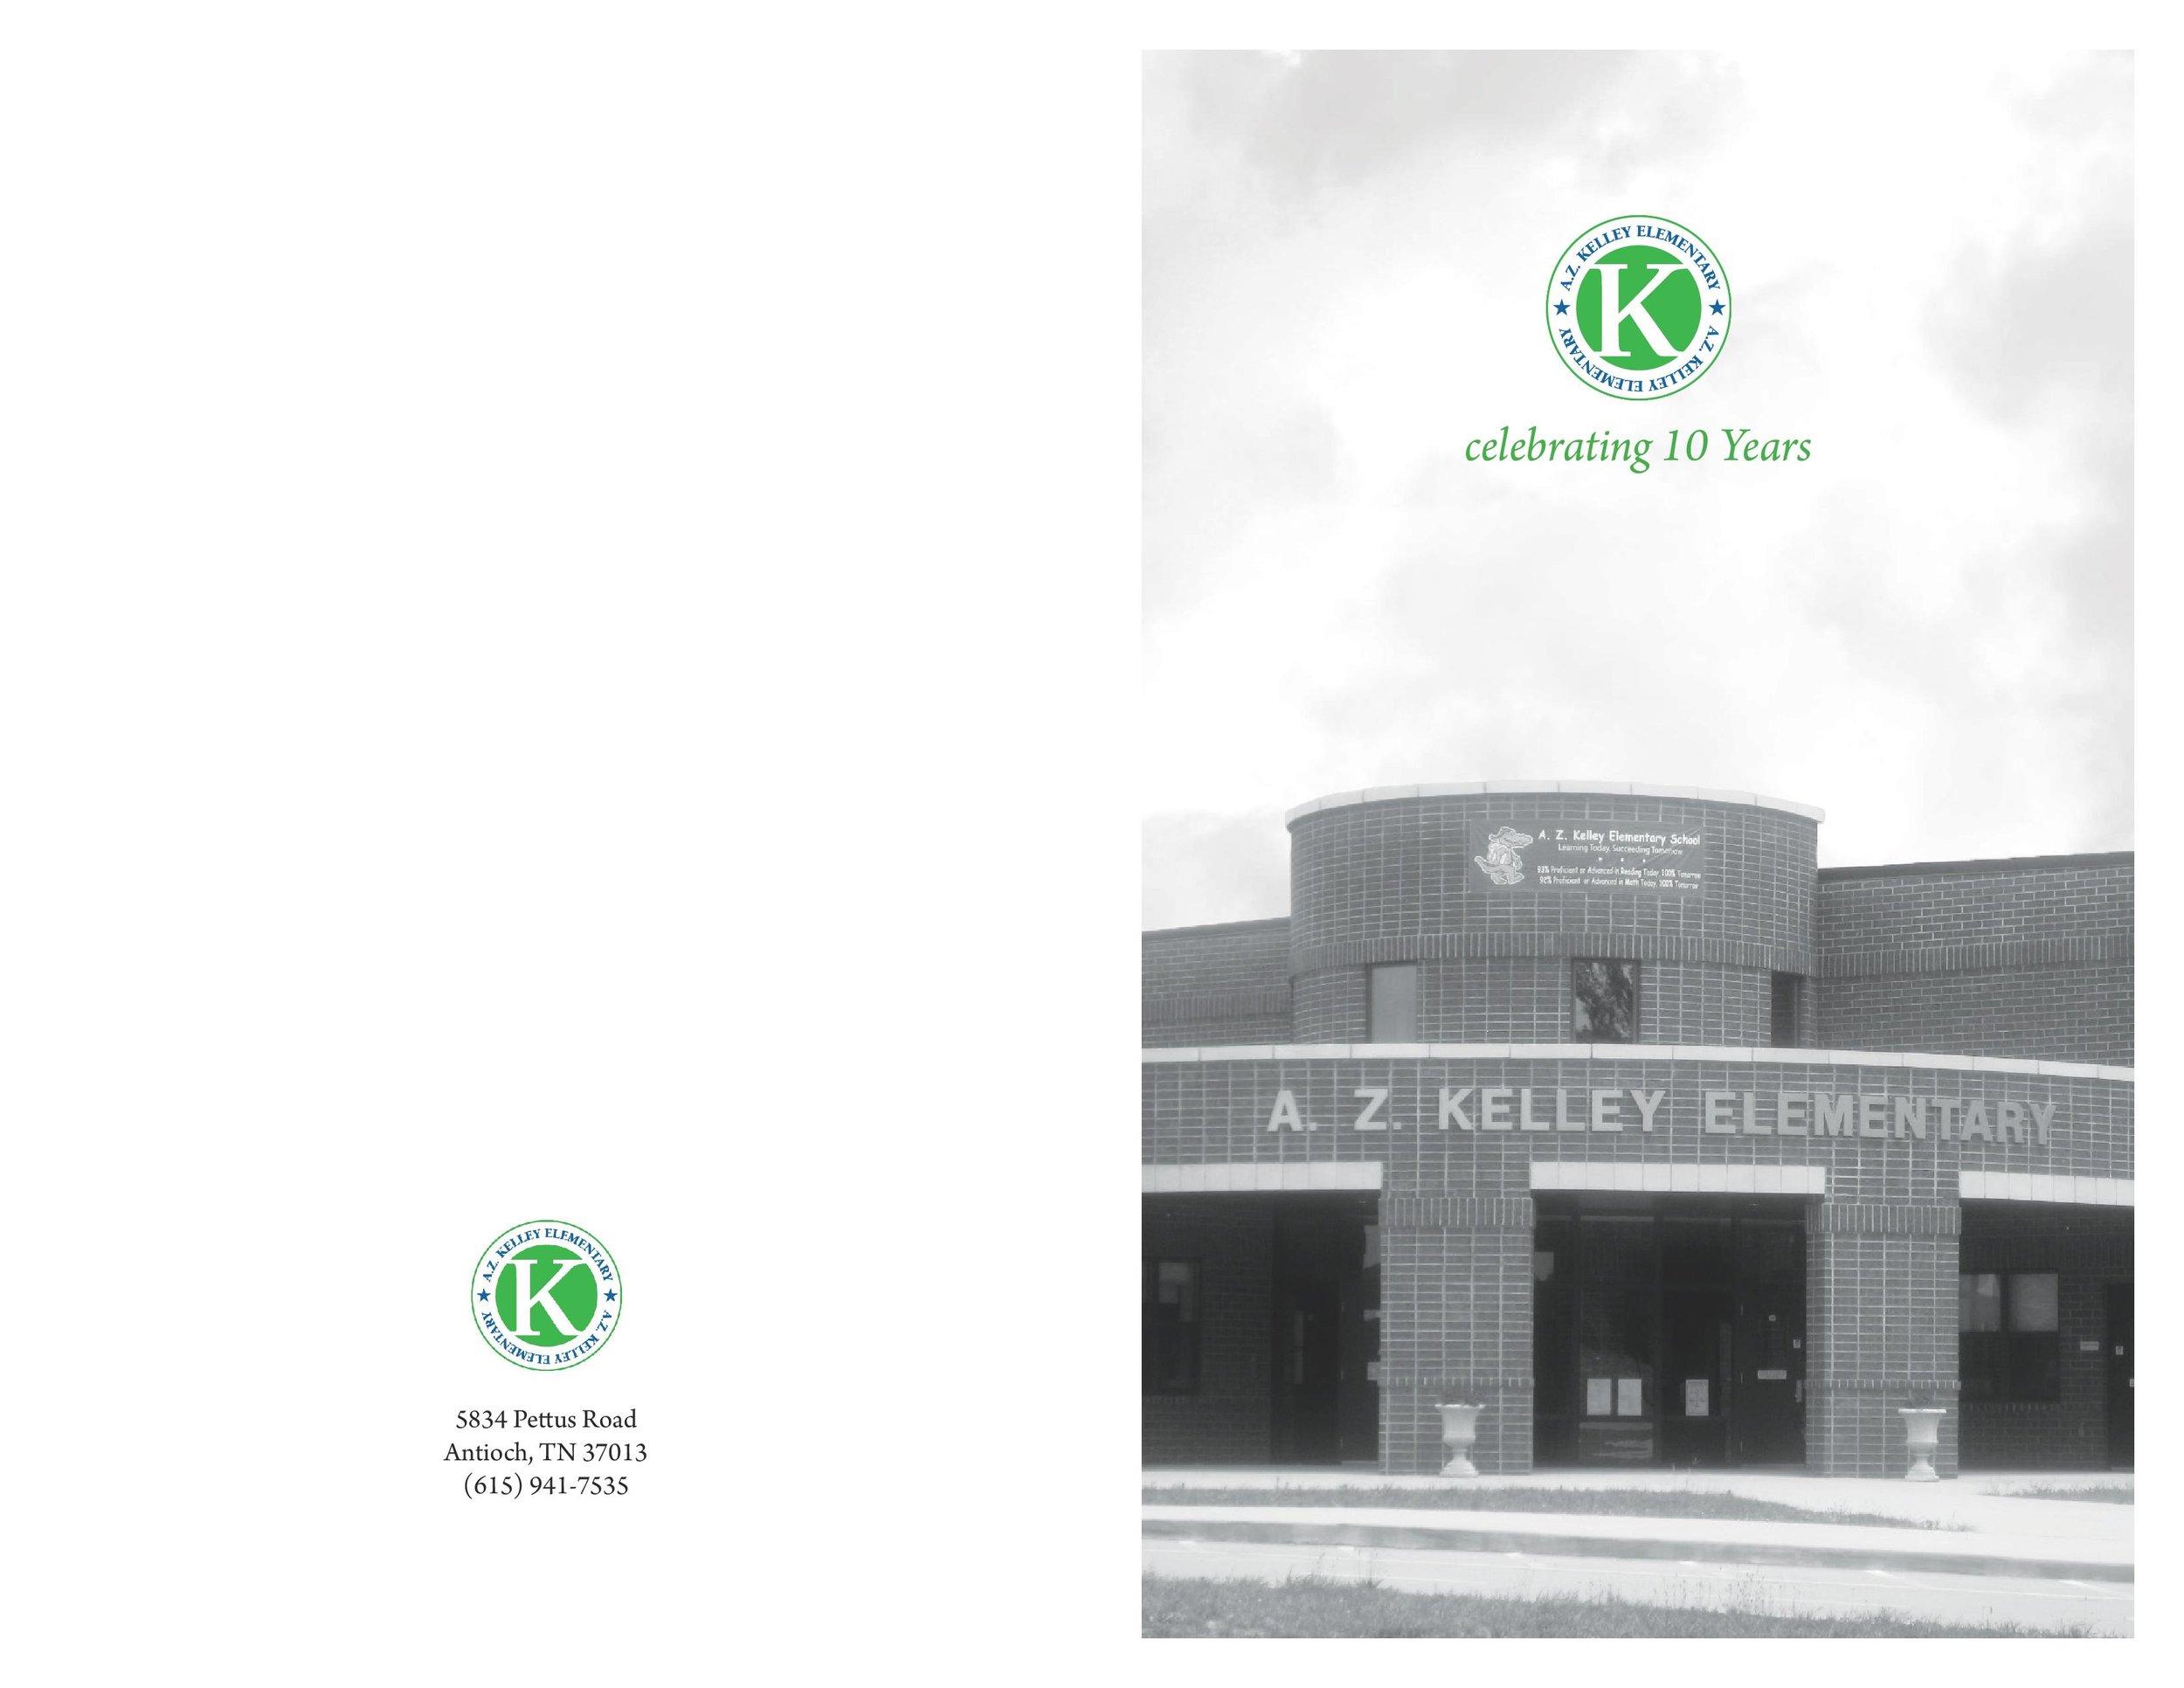 A.Z.-Kelley-Elementary_10-Yr-AnniversaryProgram_12-09-15 (1)-page-001